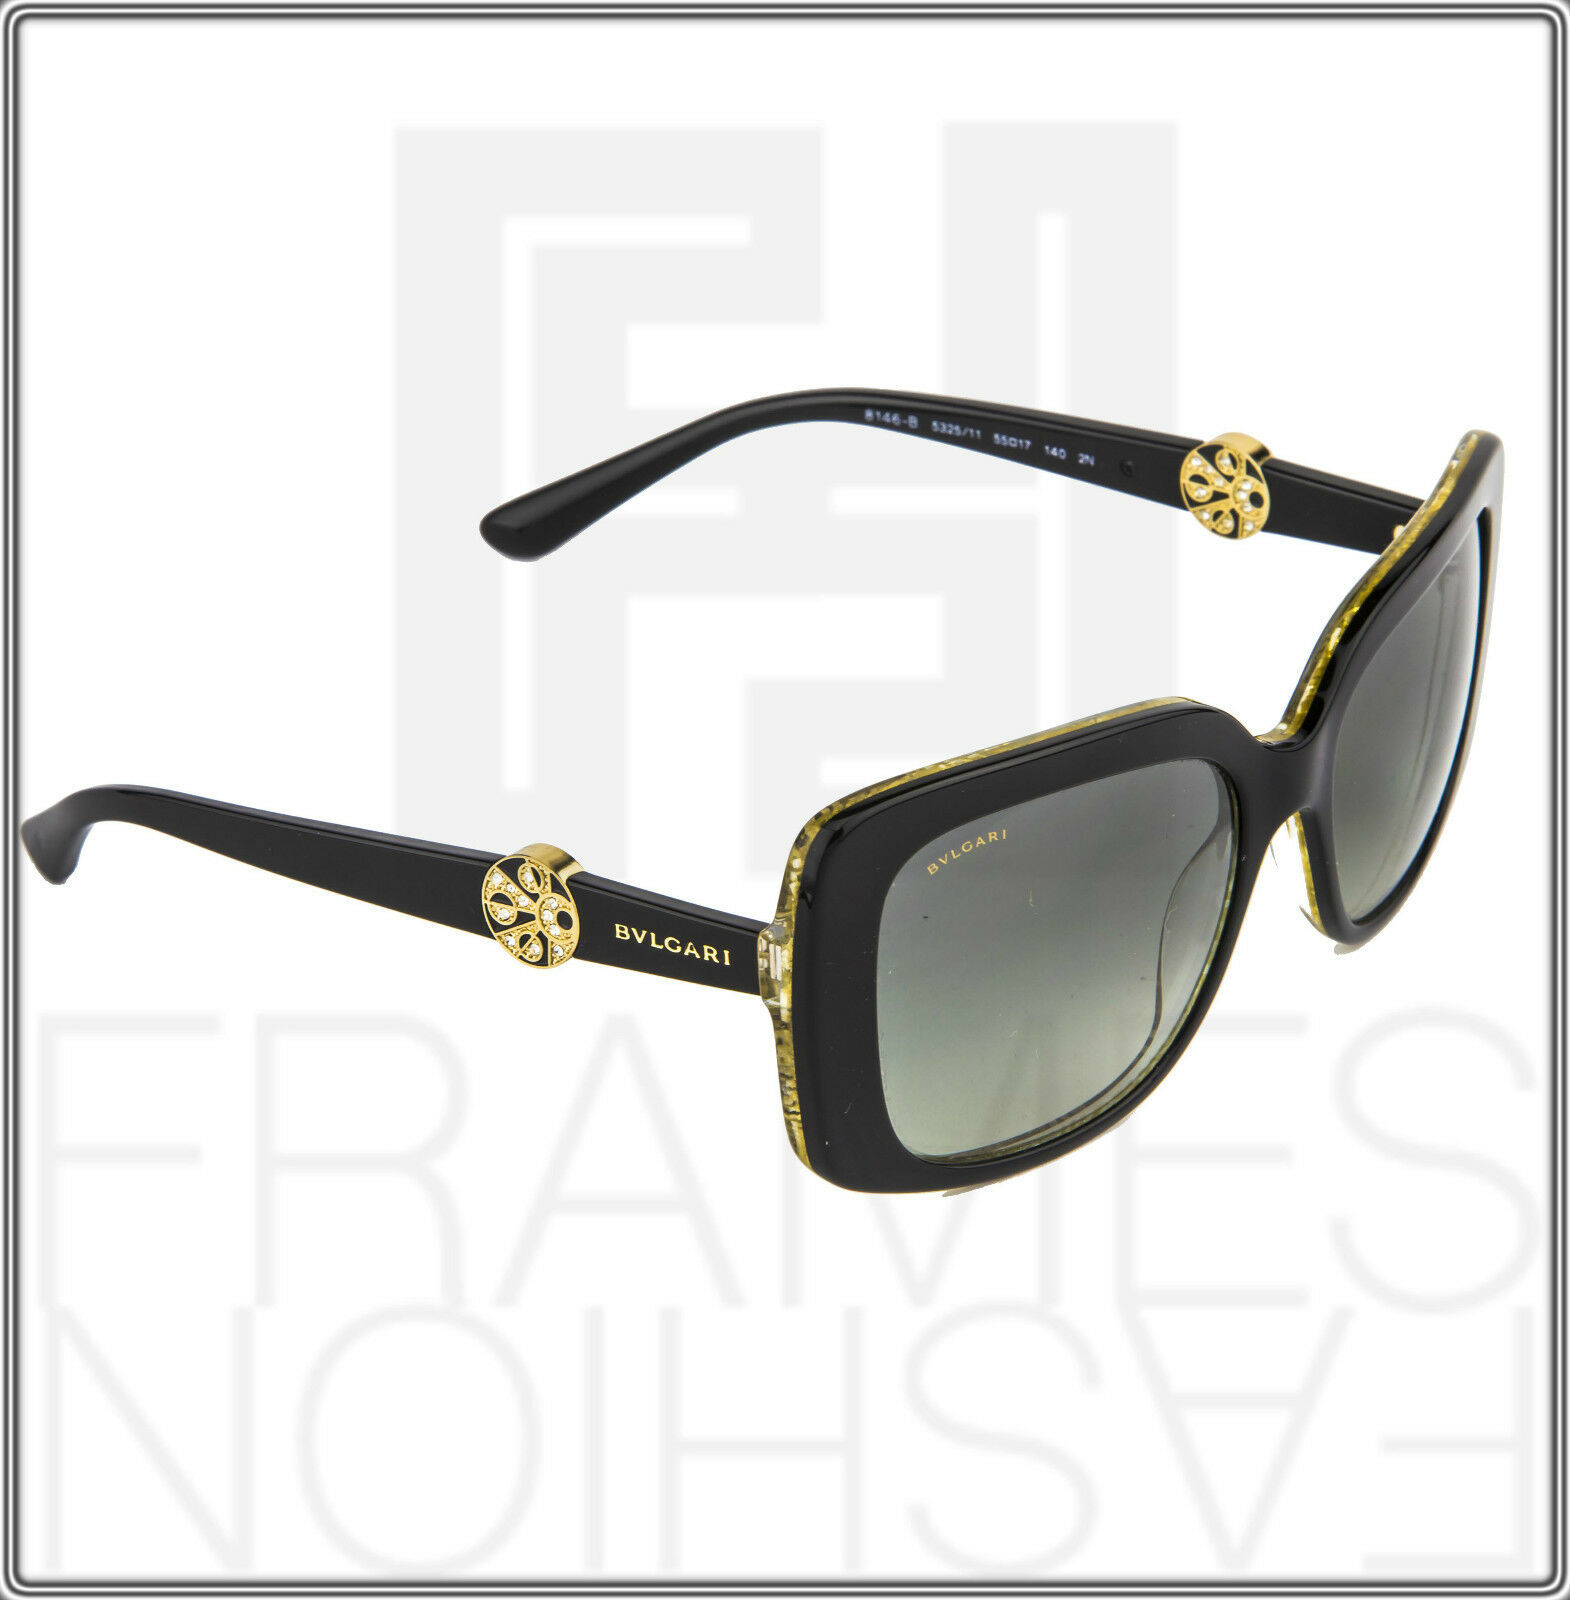 BVLGARI INTARSIO 8146B 5325/11 Black Gold Sunglasses 8146 Square Women Gradient image 6